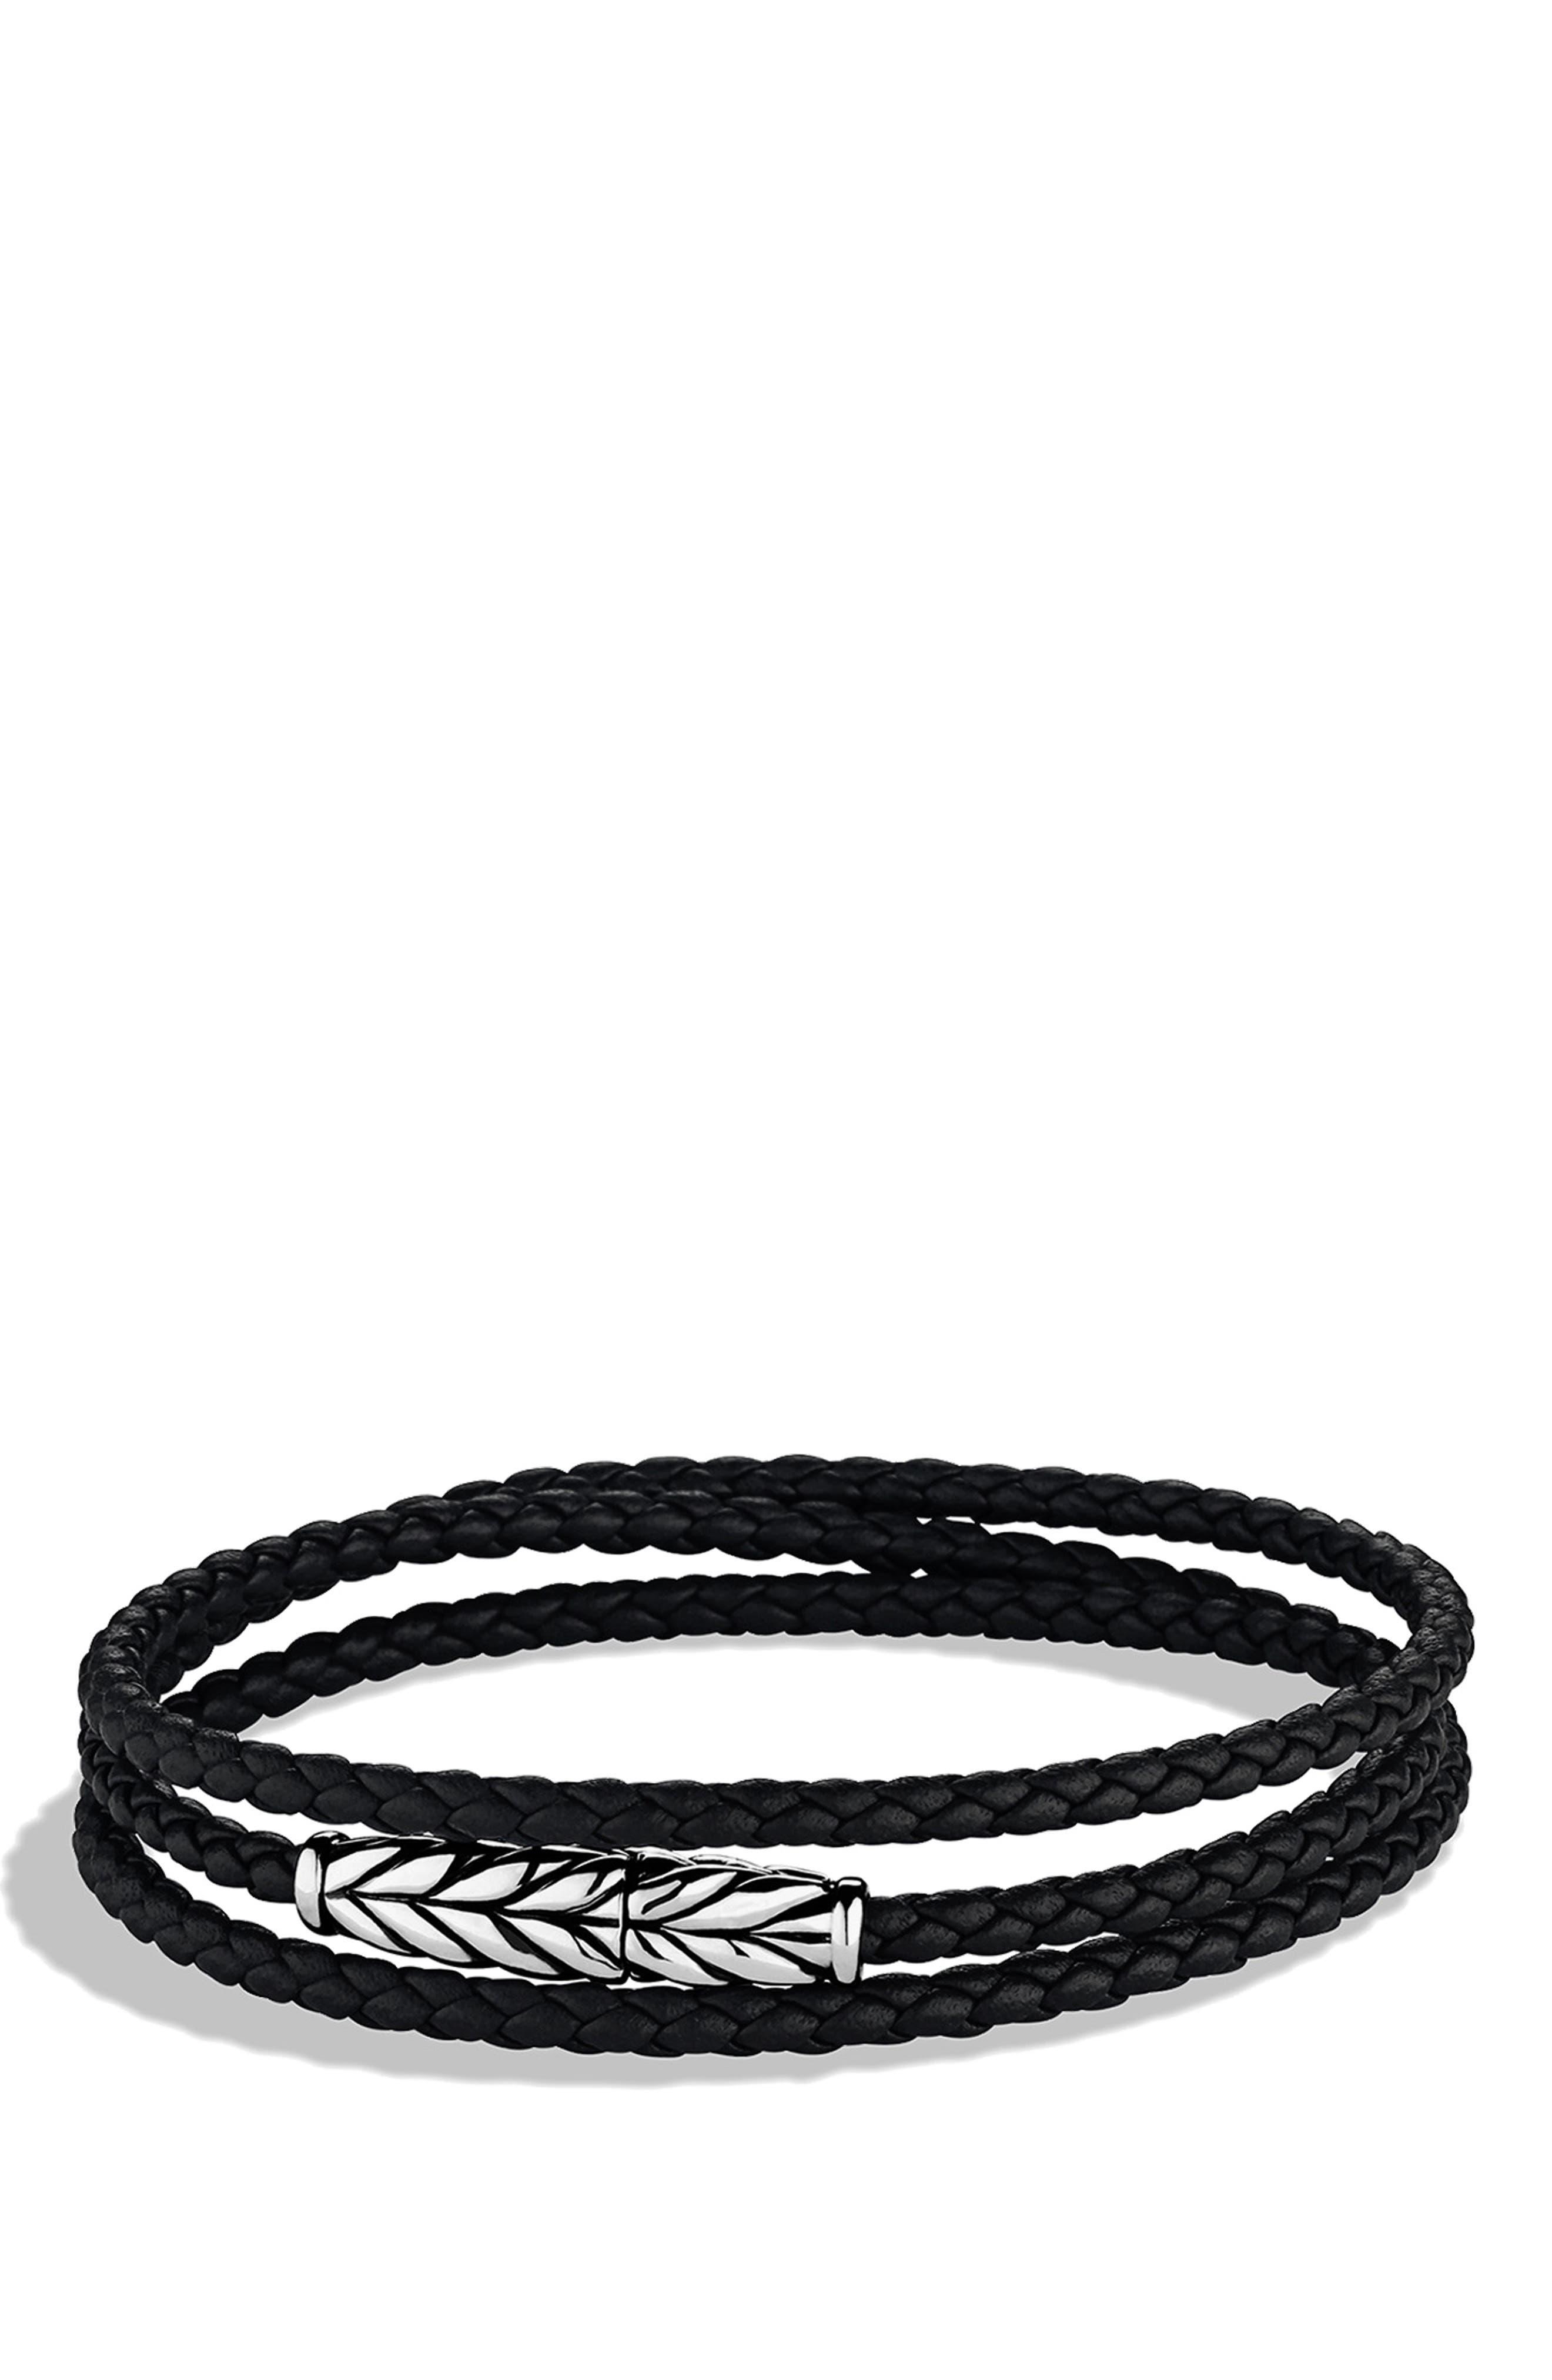 DAVID YURMAN 'Chevron' Triple-Wrap Bracelet, Main, color, BLACK LEATHER